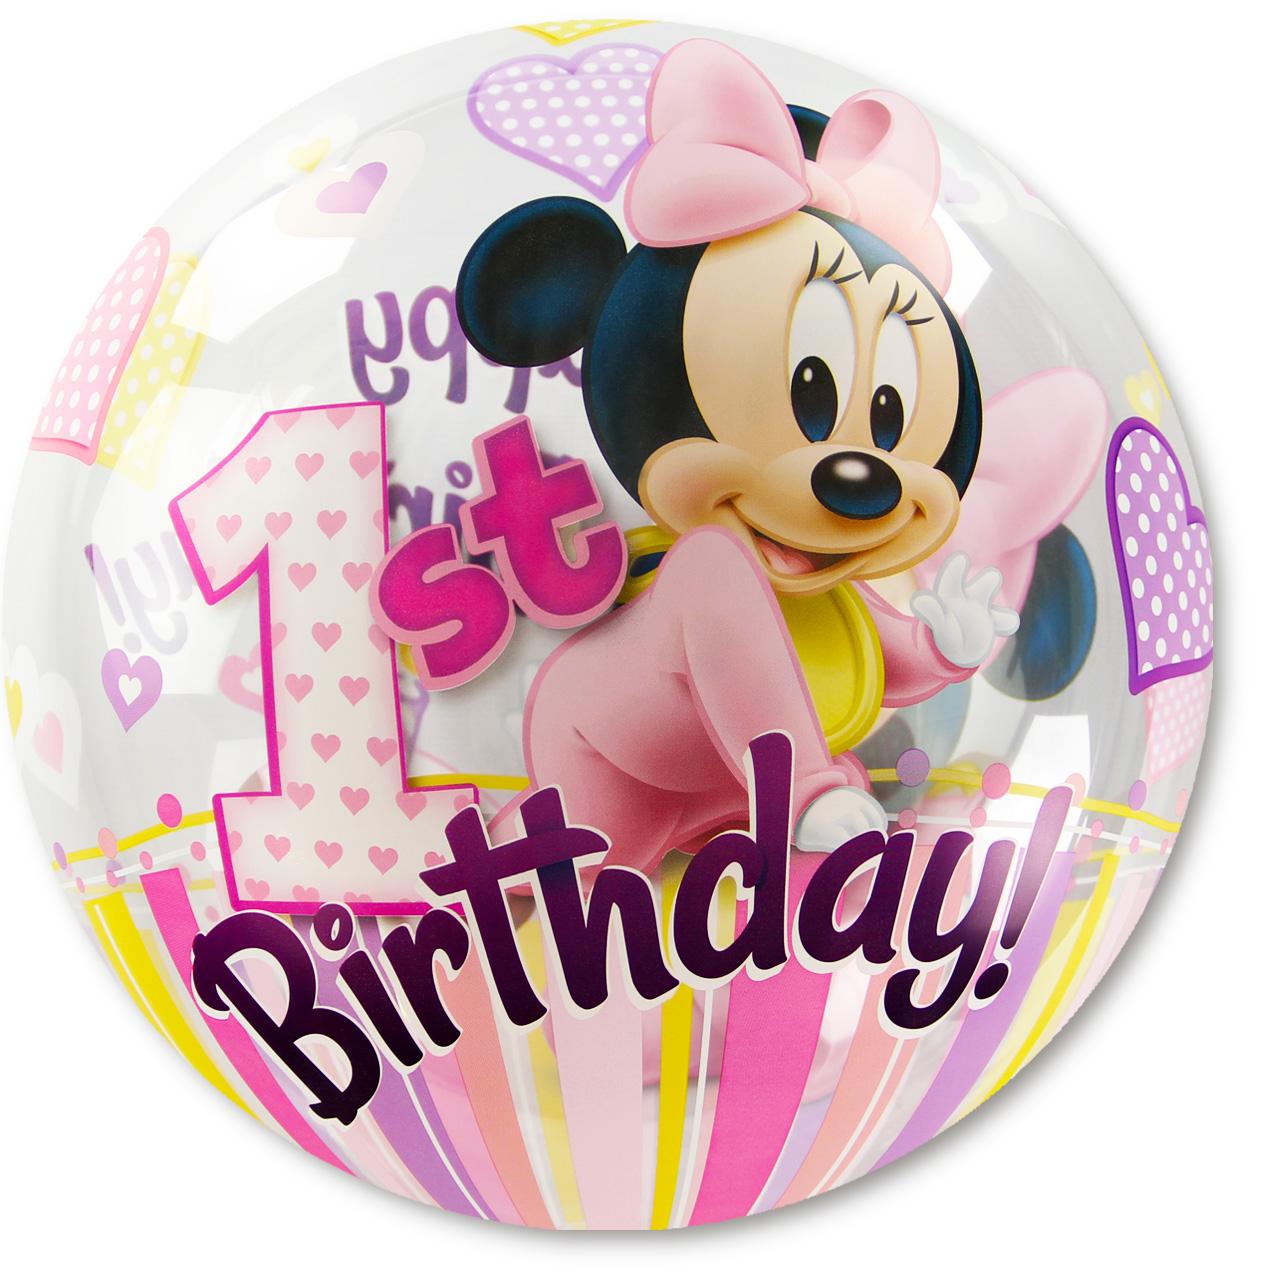 gabis ballonerie bubble ballon mickey mouse 1 geburtstag m dchen heliumgef llt. Black Bedroom Furniture Sets. Home Design Ideas